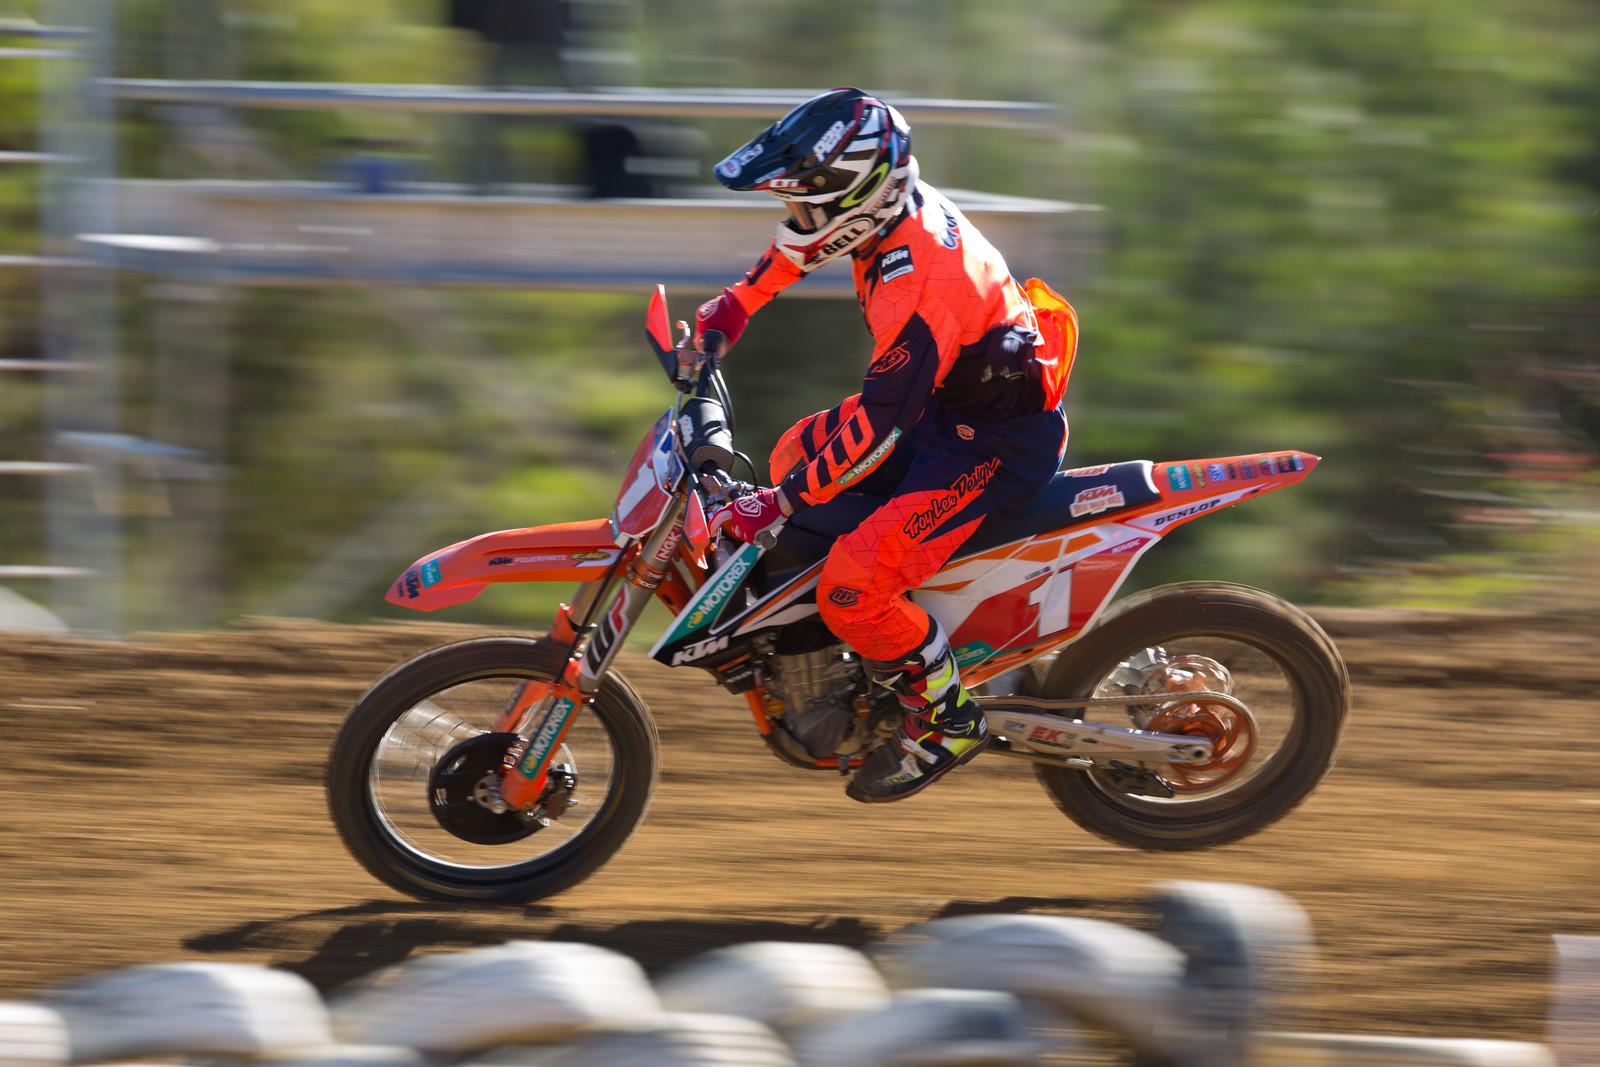 Kirk Gibbs - Australian Motul MX Championships: Round 6, Nowra - Motocross Pictures - Vital MX